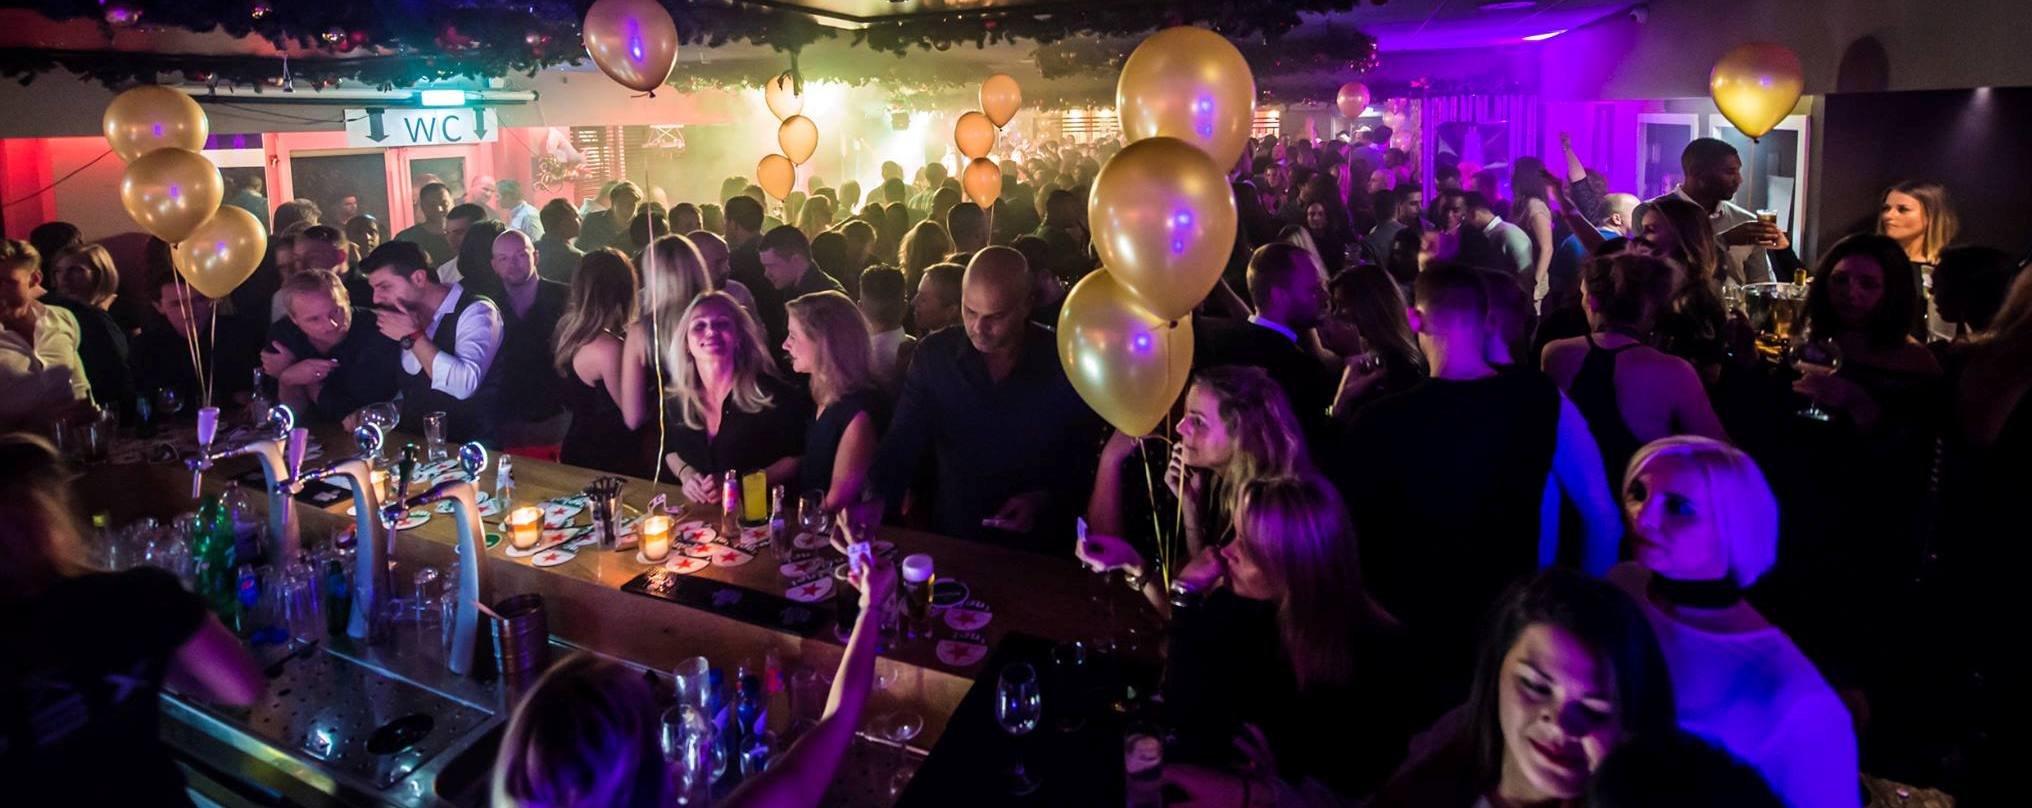 Corona proof feest organiseren